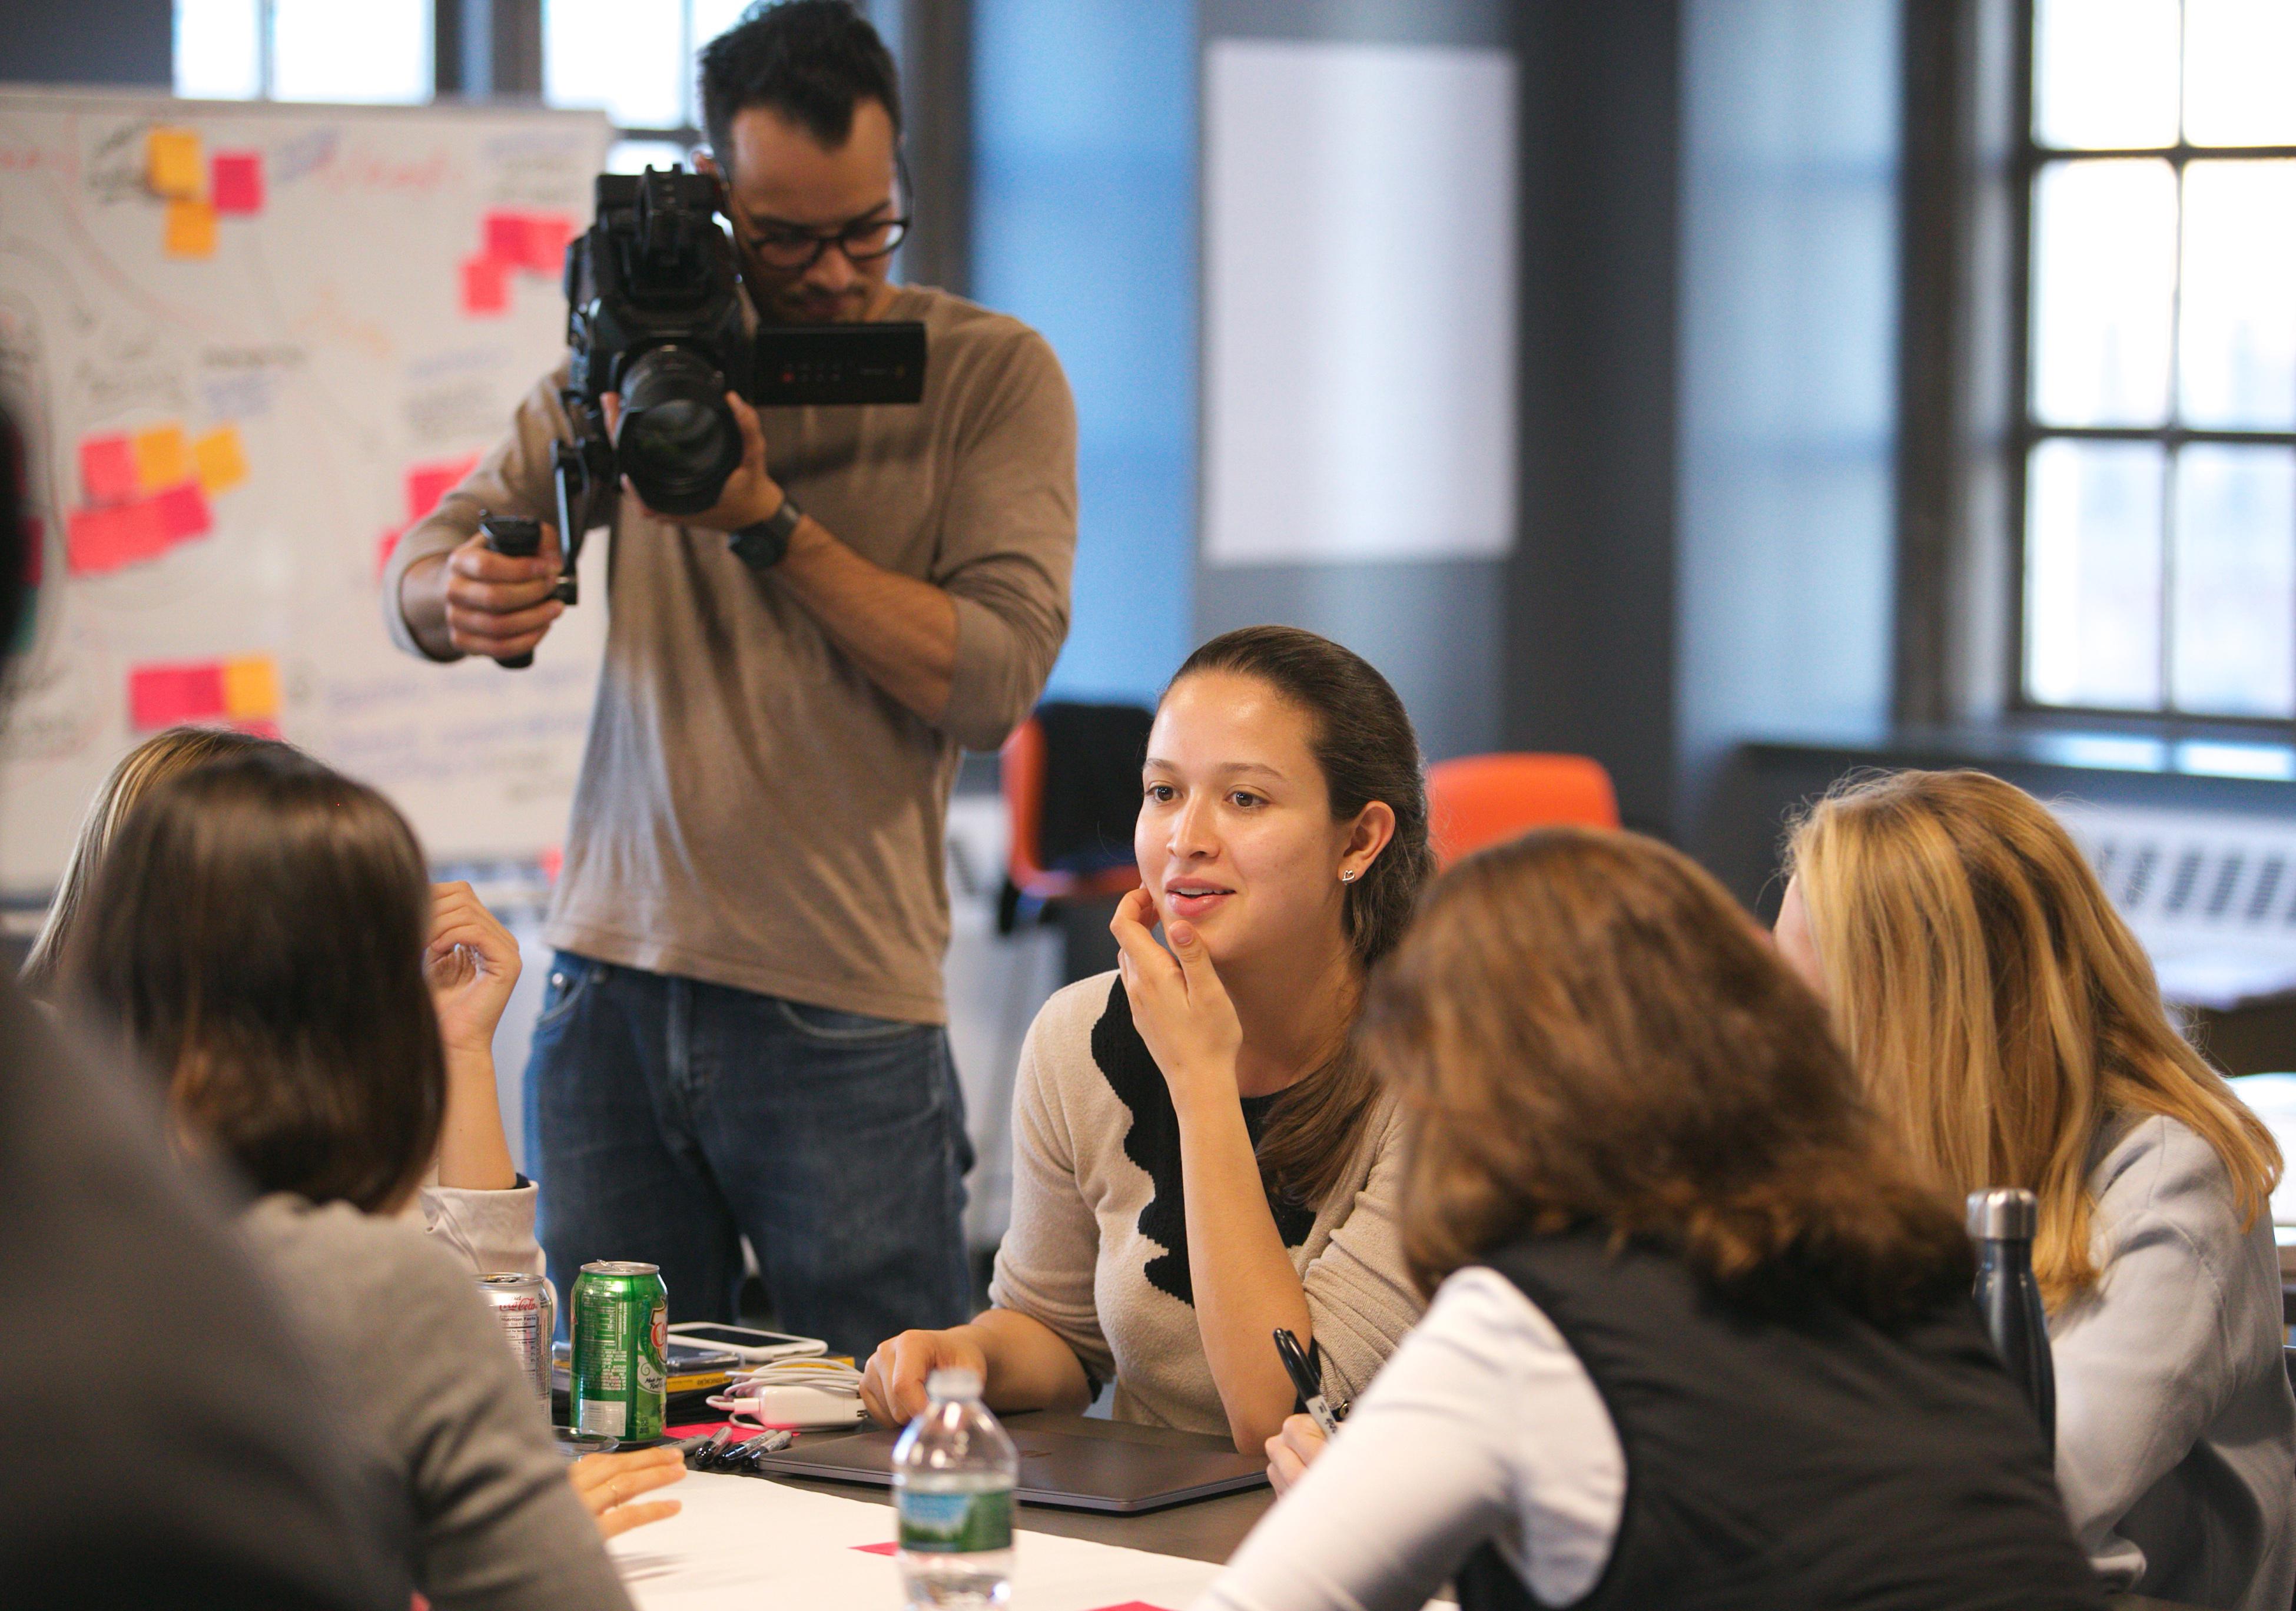 Cameraman films progress in the EdTech Design Challenge